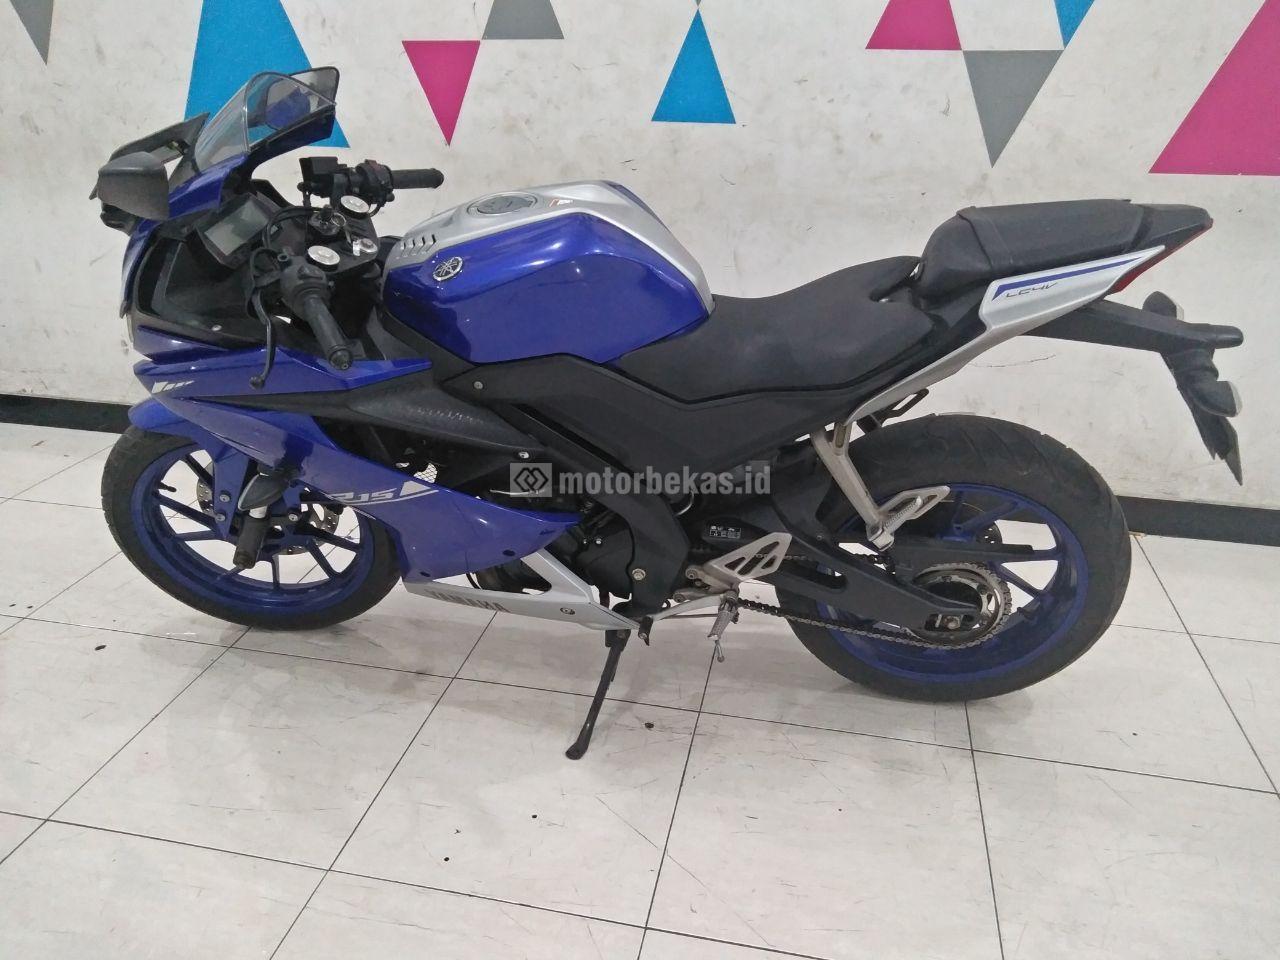 YAMAHA R15 V3 MOVISTAR  3088 motorbekas.id